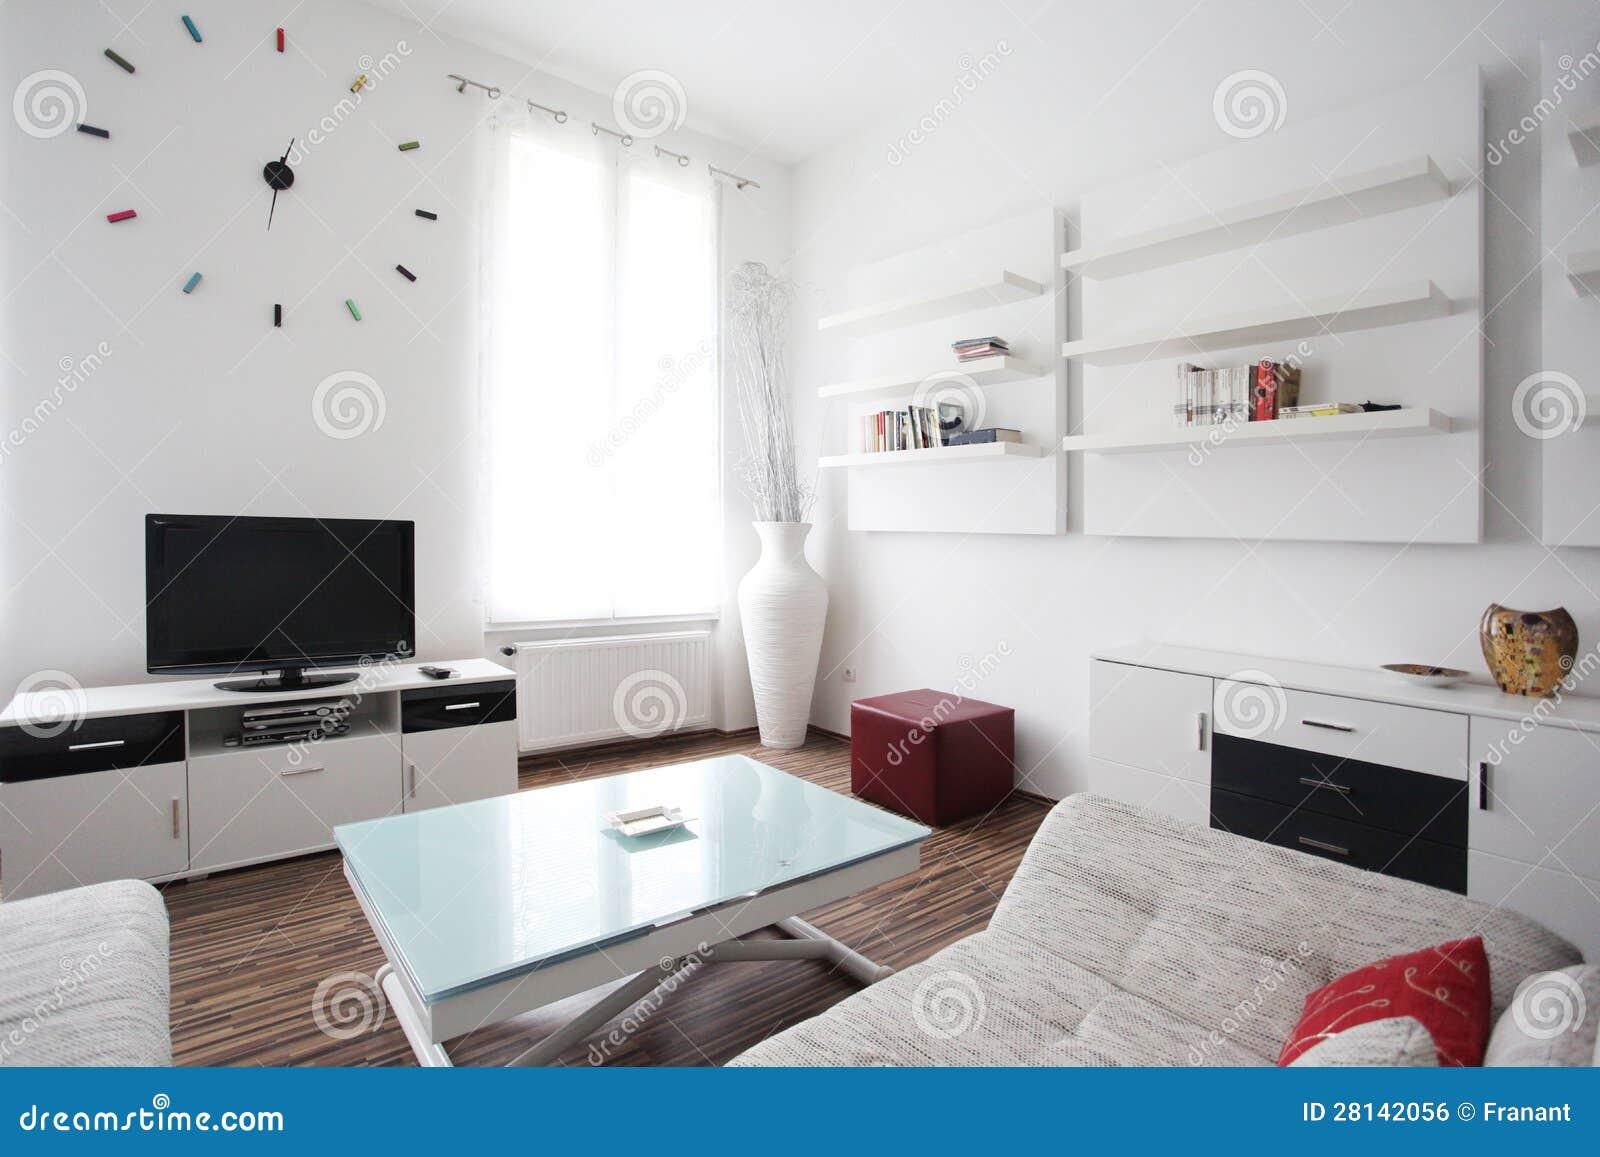 Het binnenlandse ontwerp van de woonkamer stock foto afbeelding 28142056 - Fotos van moderne woonkamer ...